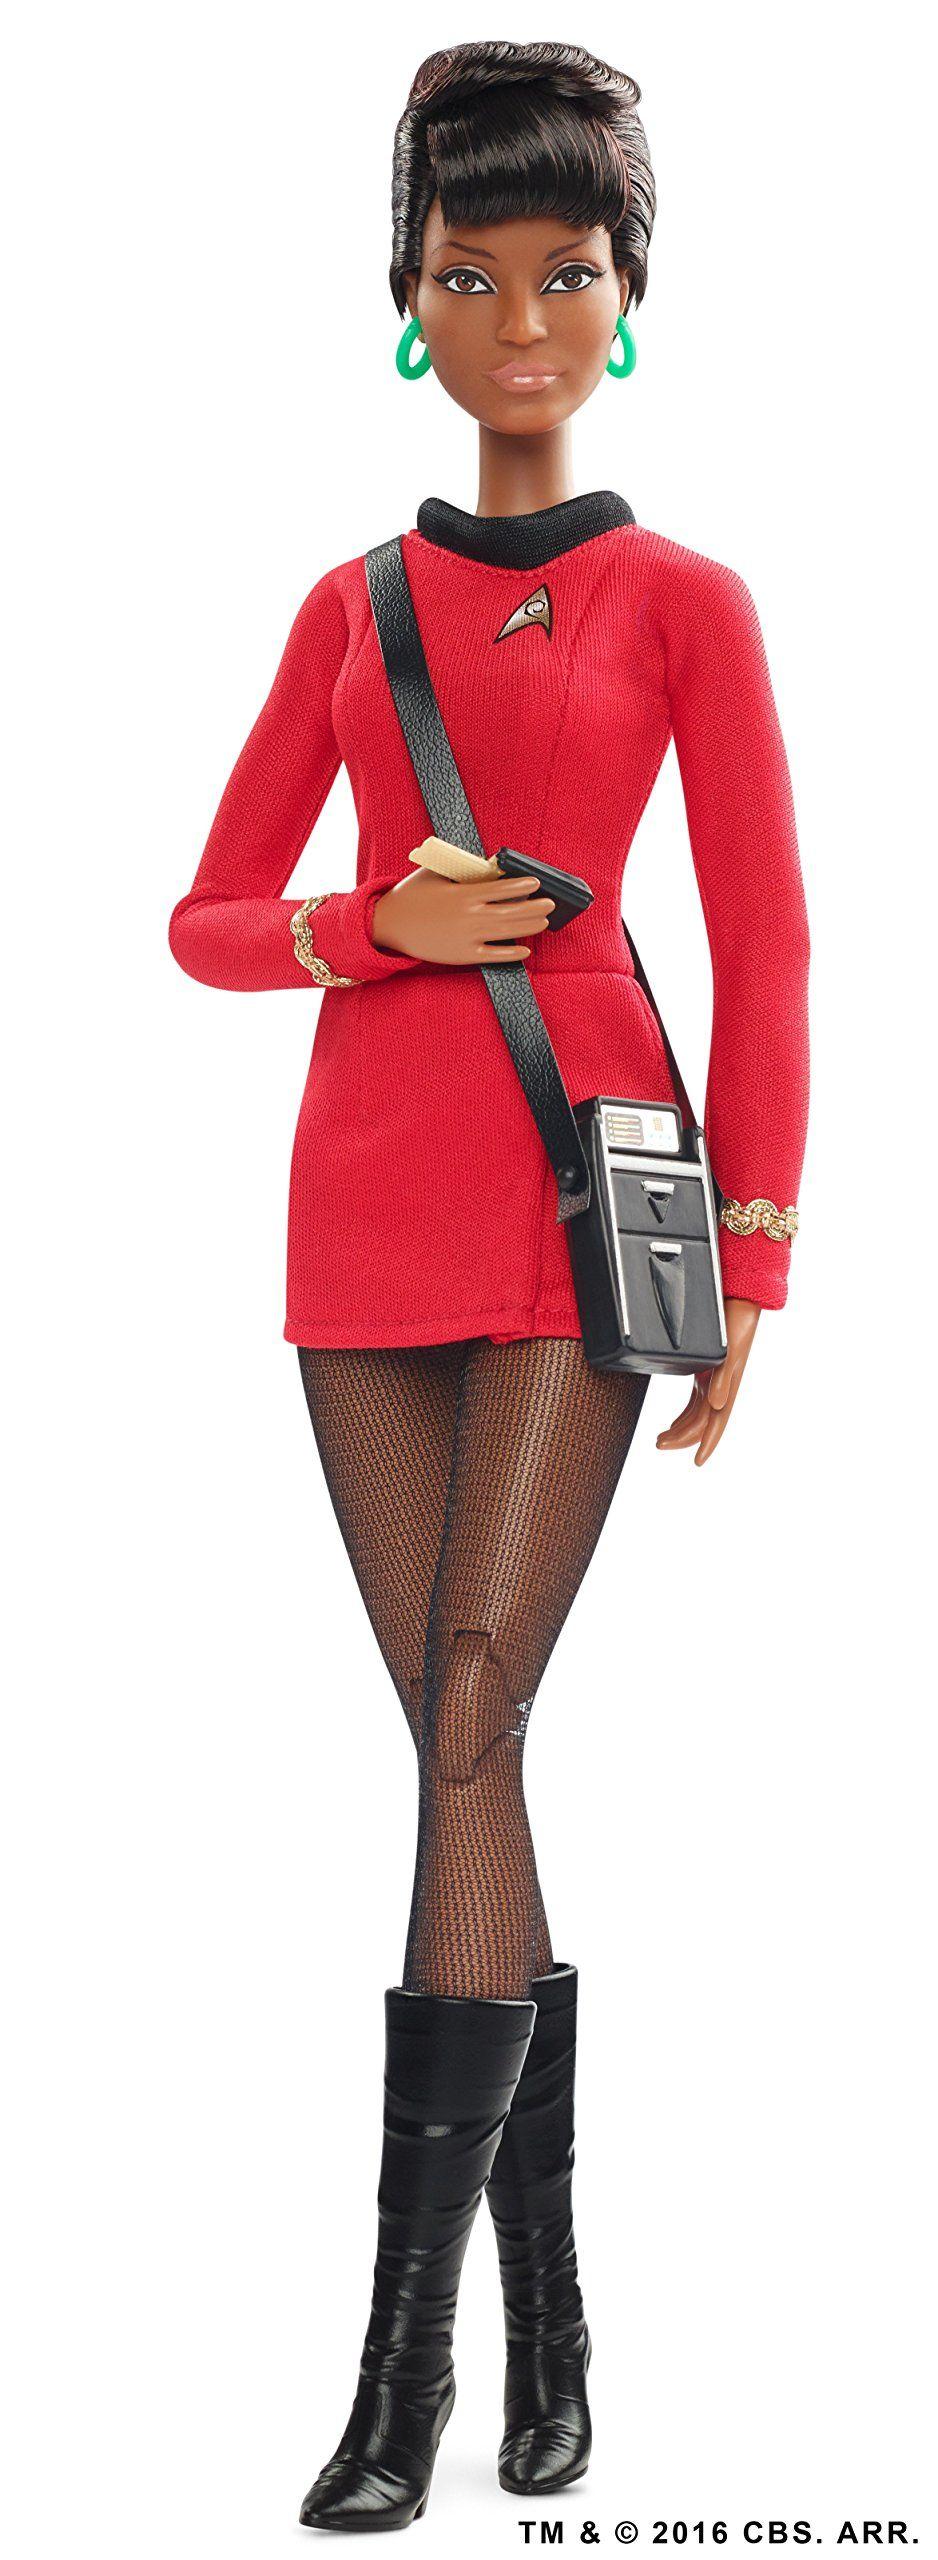 Barbie Star Trek 50th Anniversary Uhura Doll